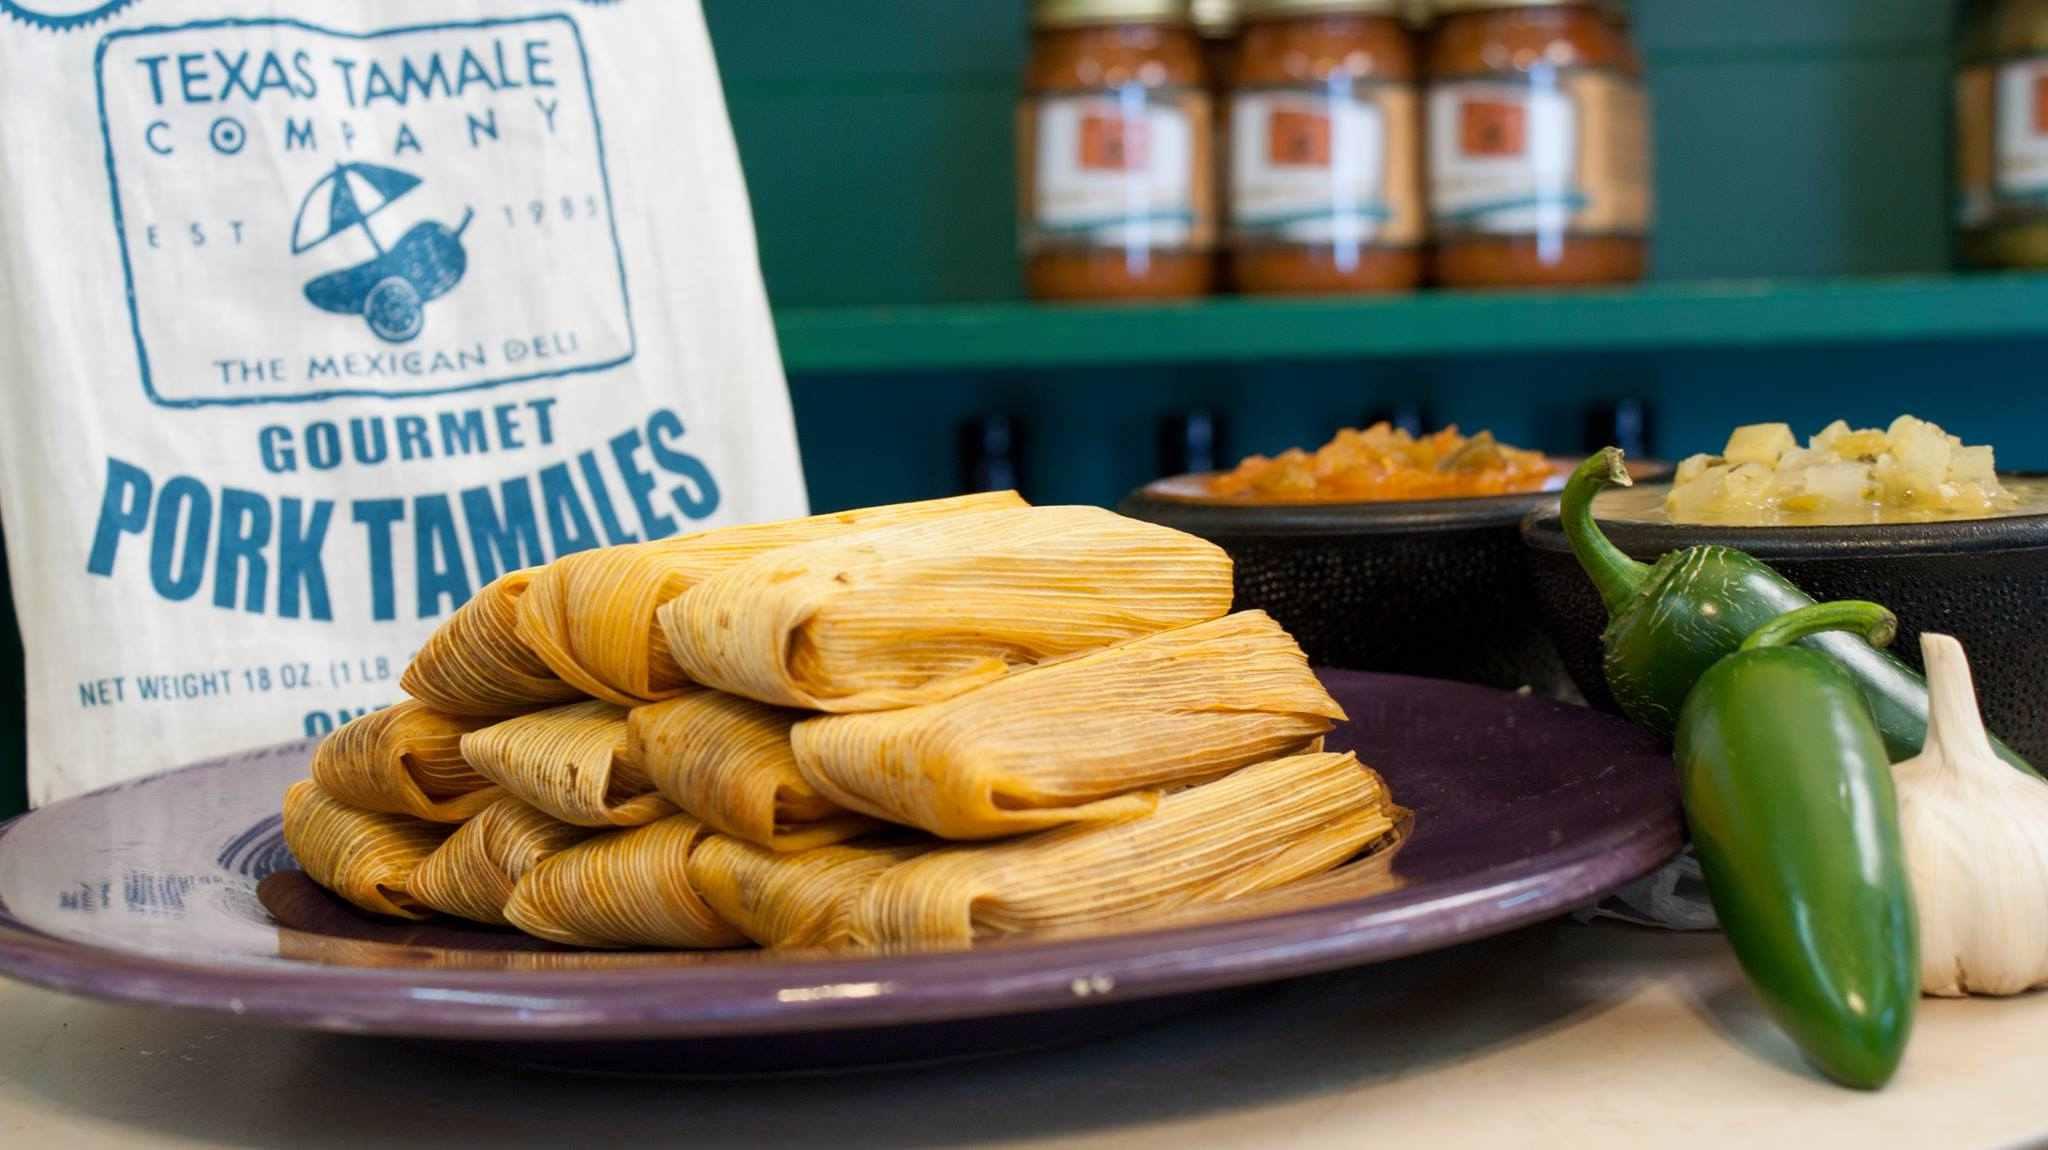 Texas Tamale Company tamales